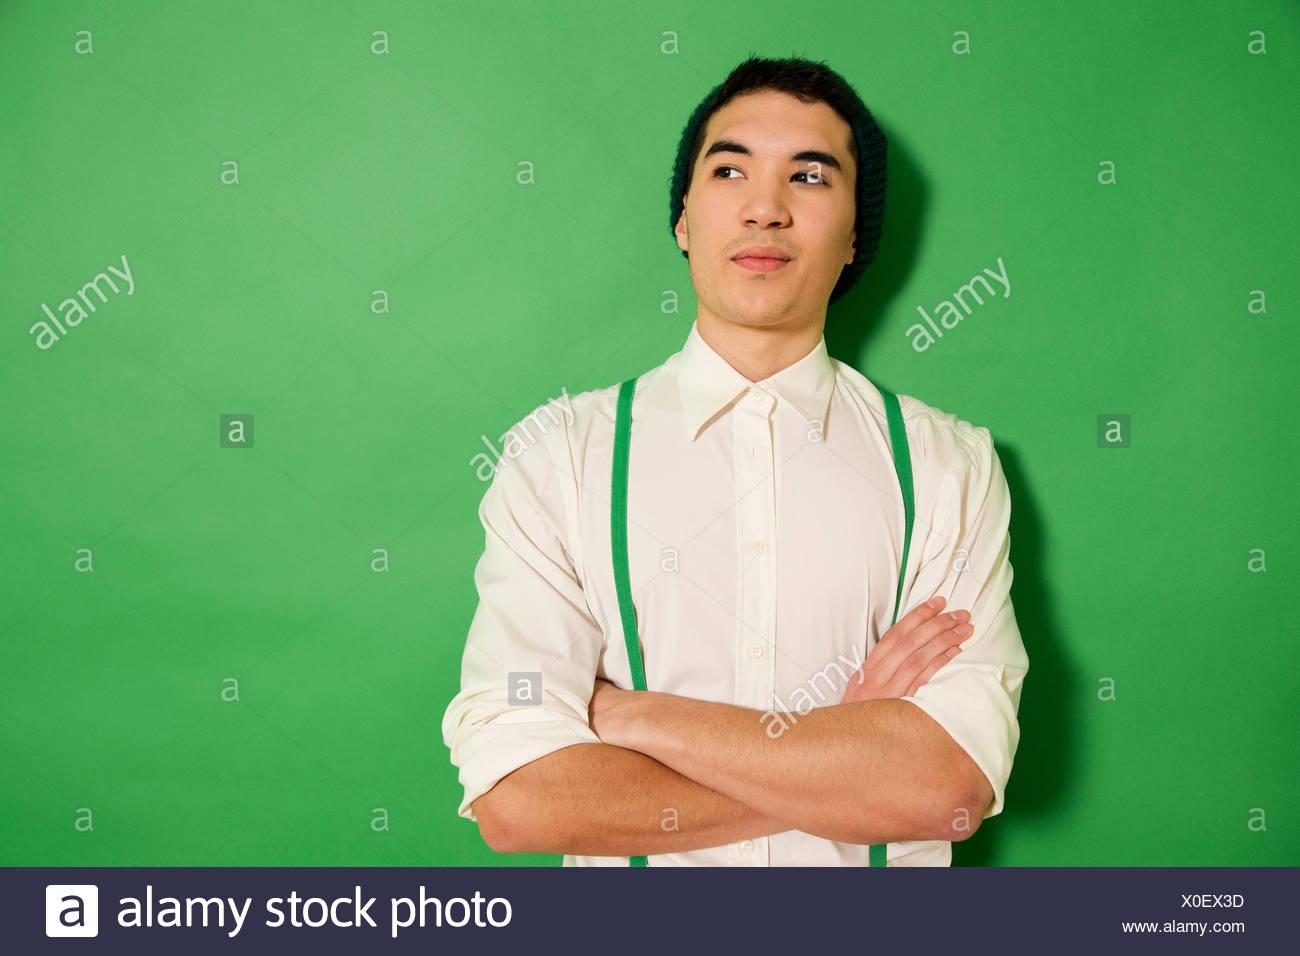 immer beliebt UK-Shop bekannte Marke Porträt des jungen Mannes tragen grüne Hosenträger Stockfoto ...